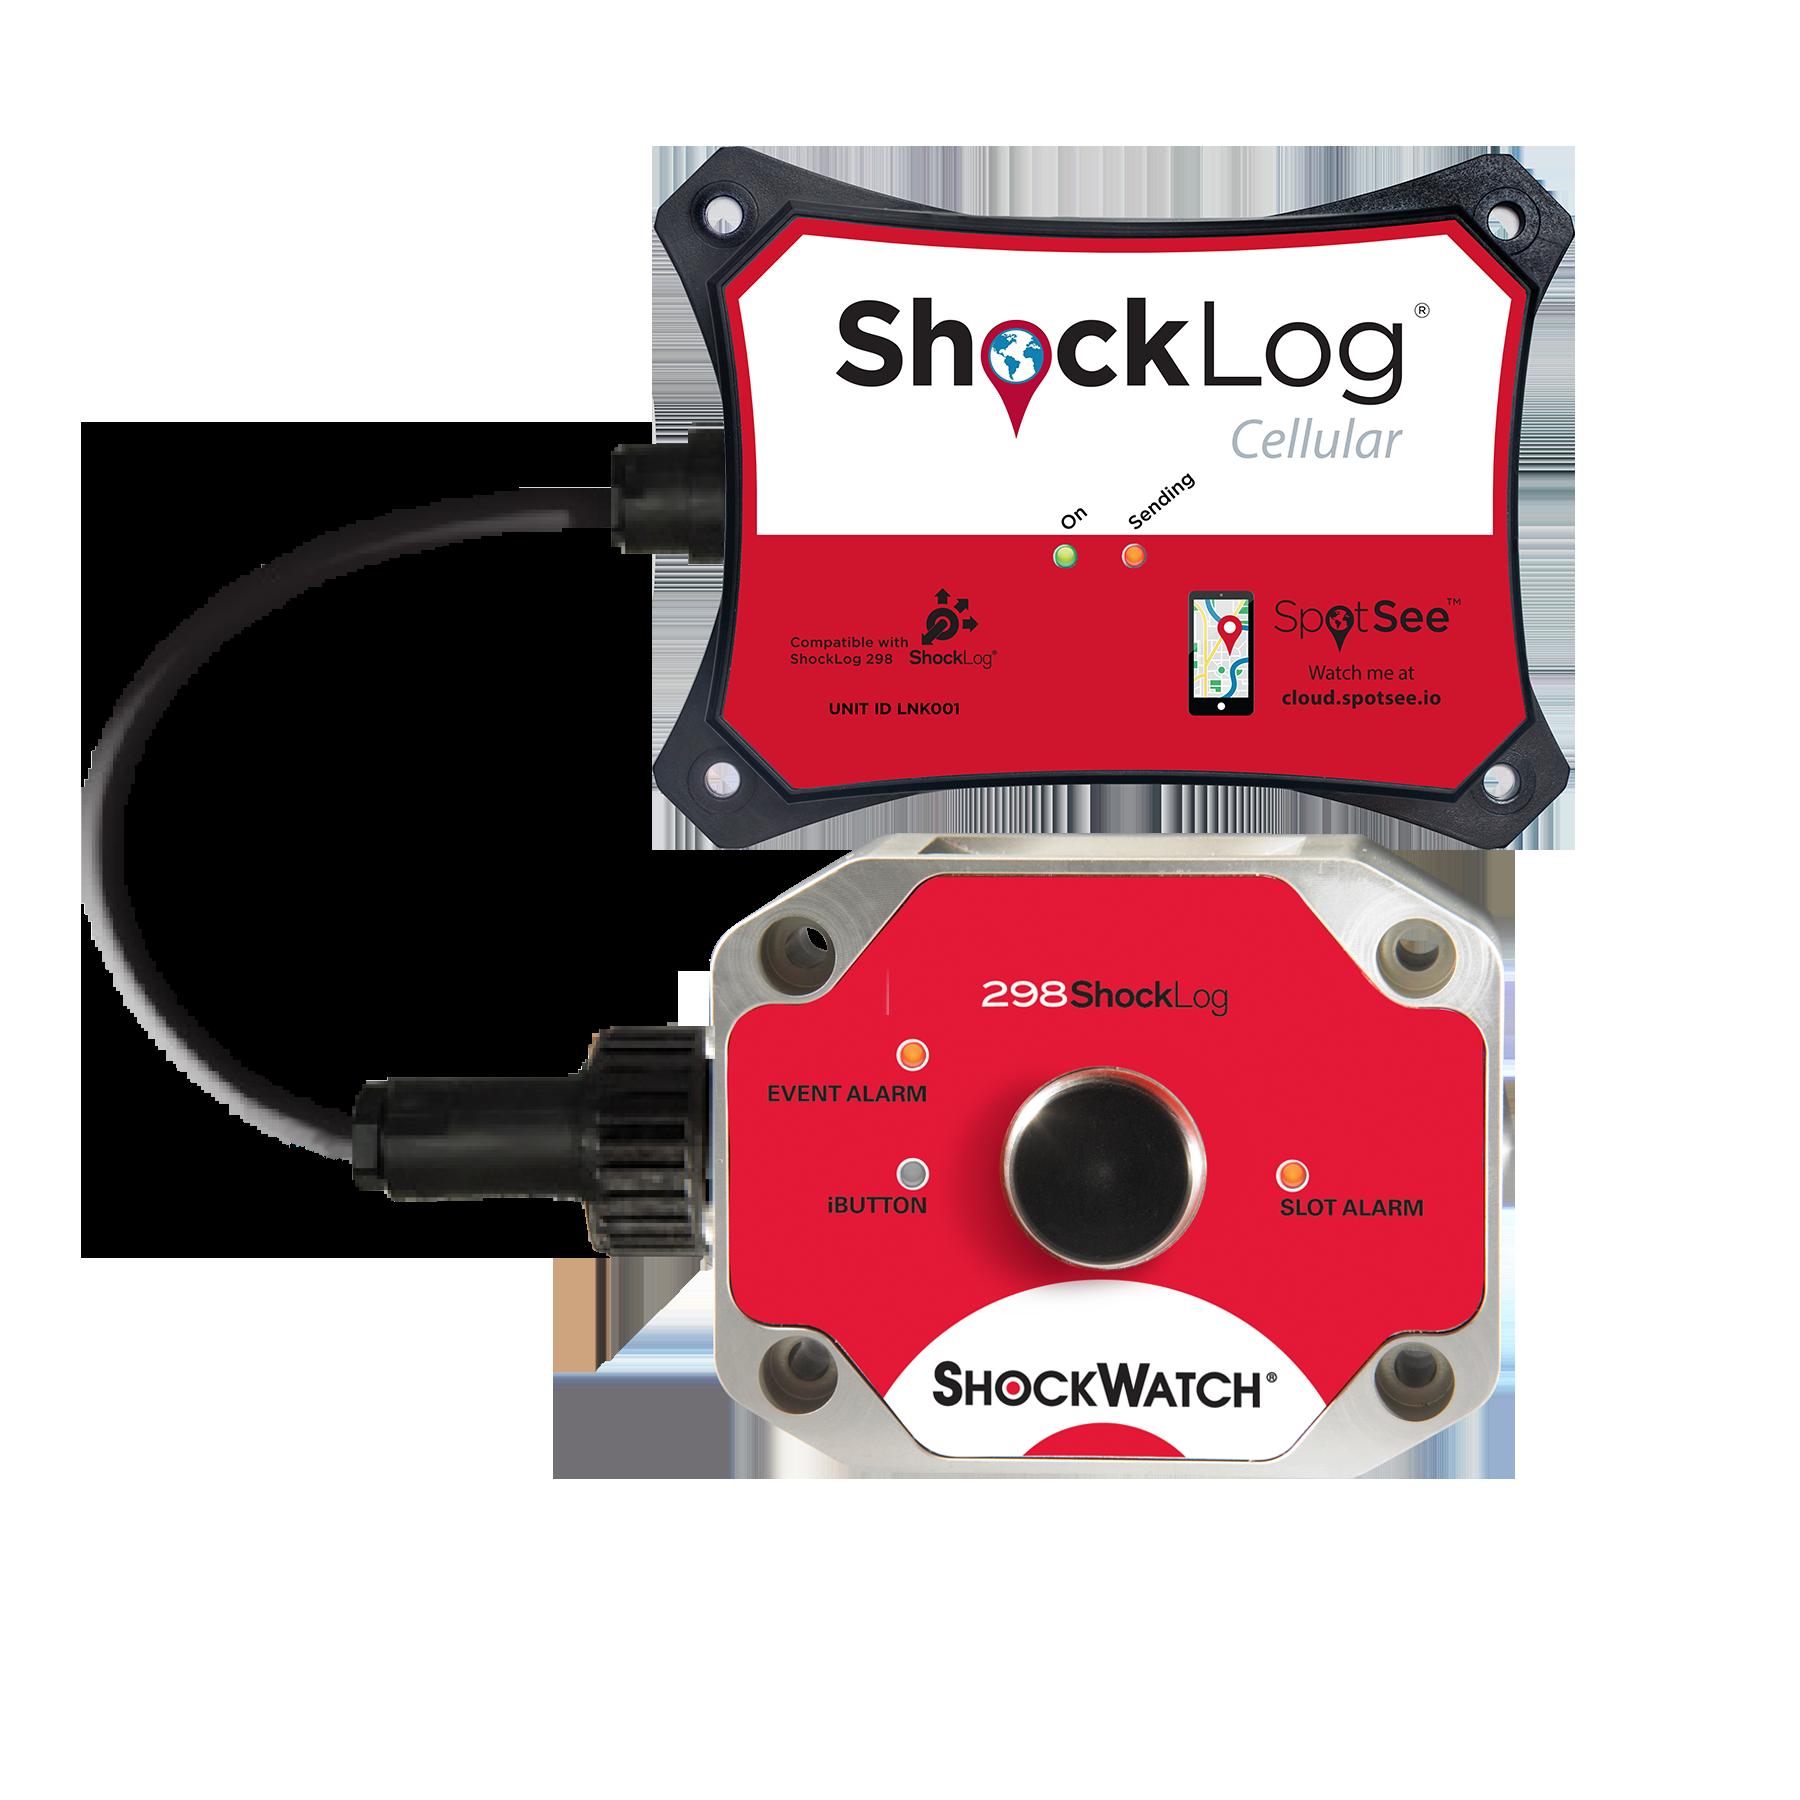 ShockLog Cellular-1